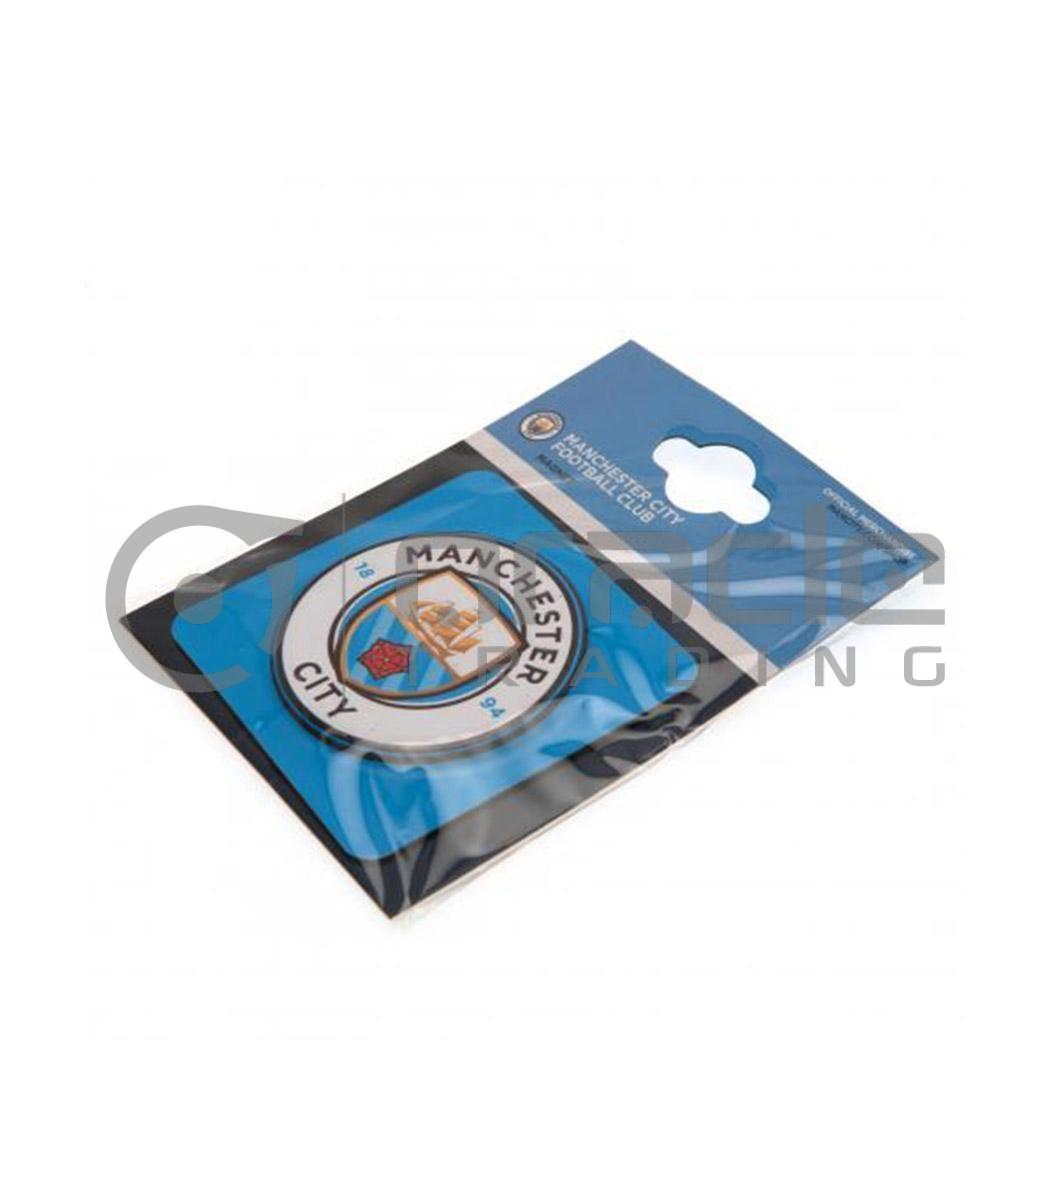 Manchester City 3D Magnet